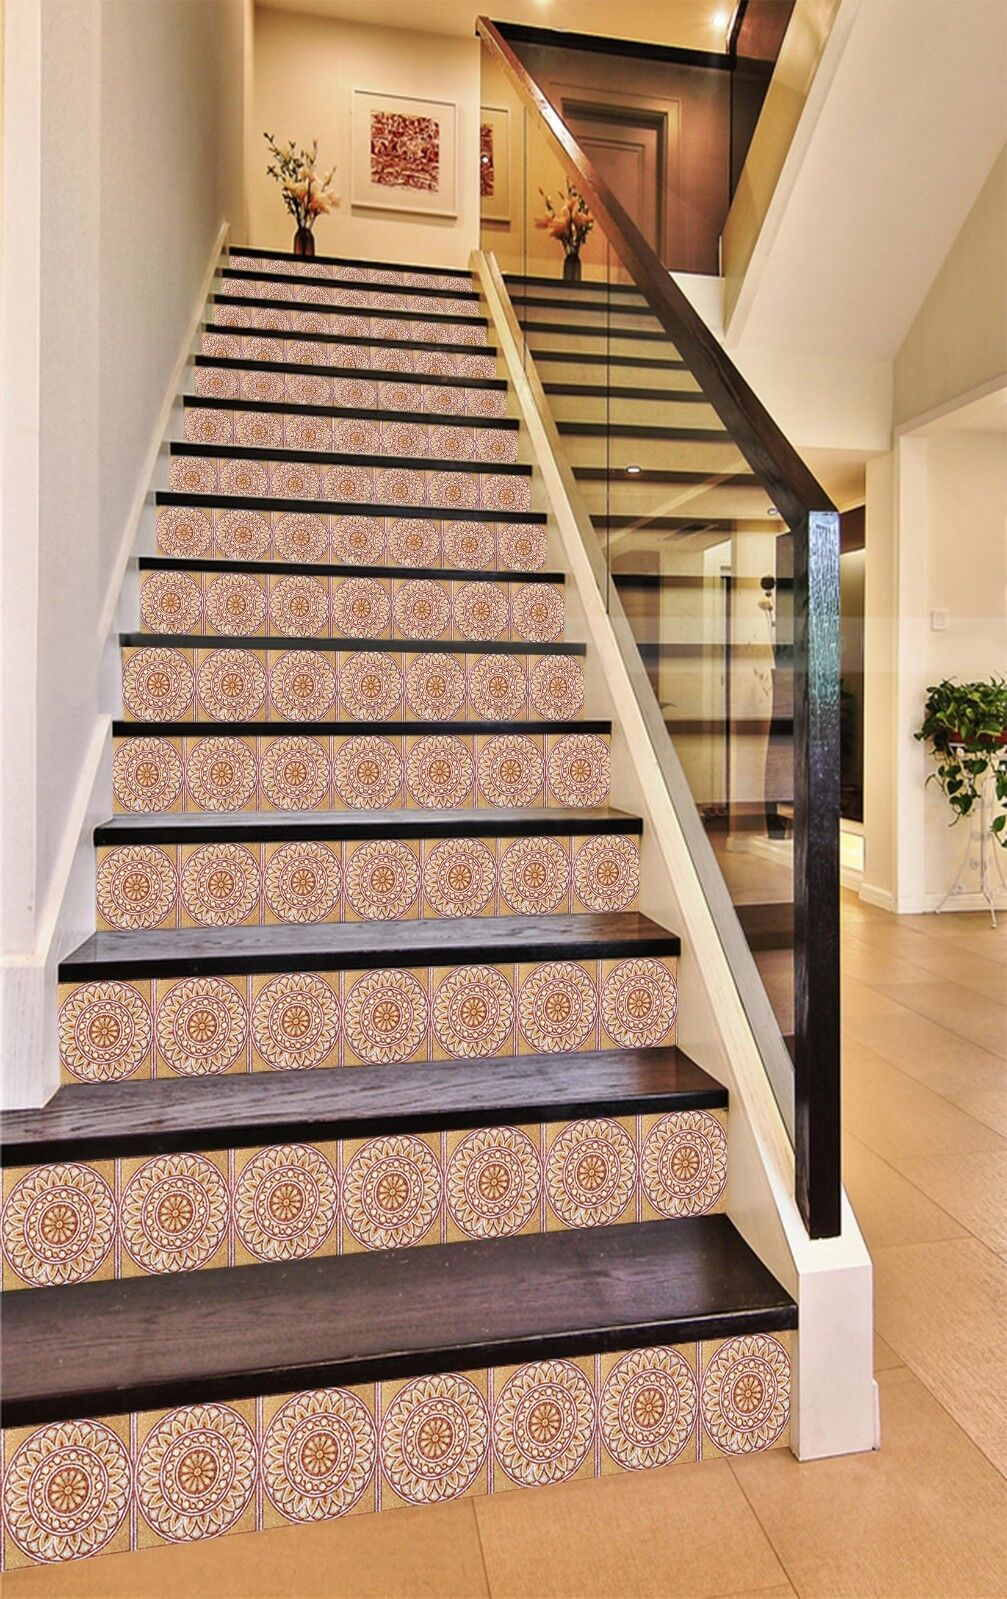 3D Texture 447 Stair Riser Dekoration Photo Mural Vinyl Decal Wallpaper UK Lemon